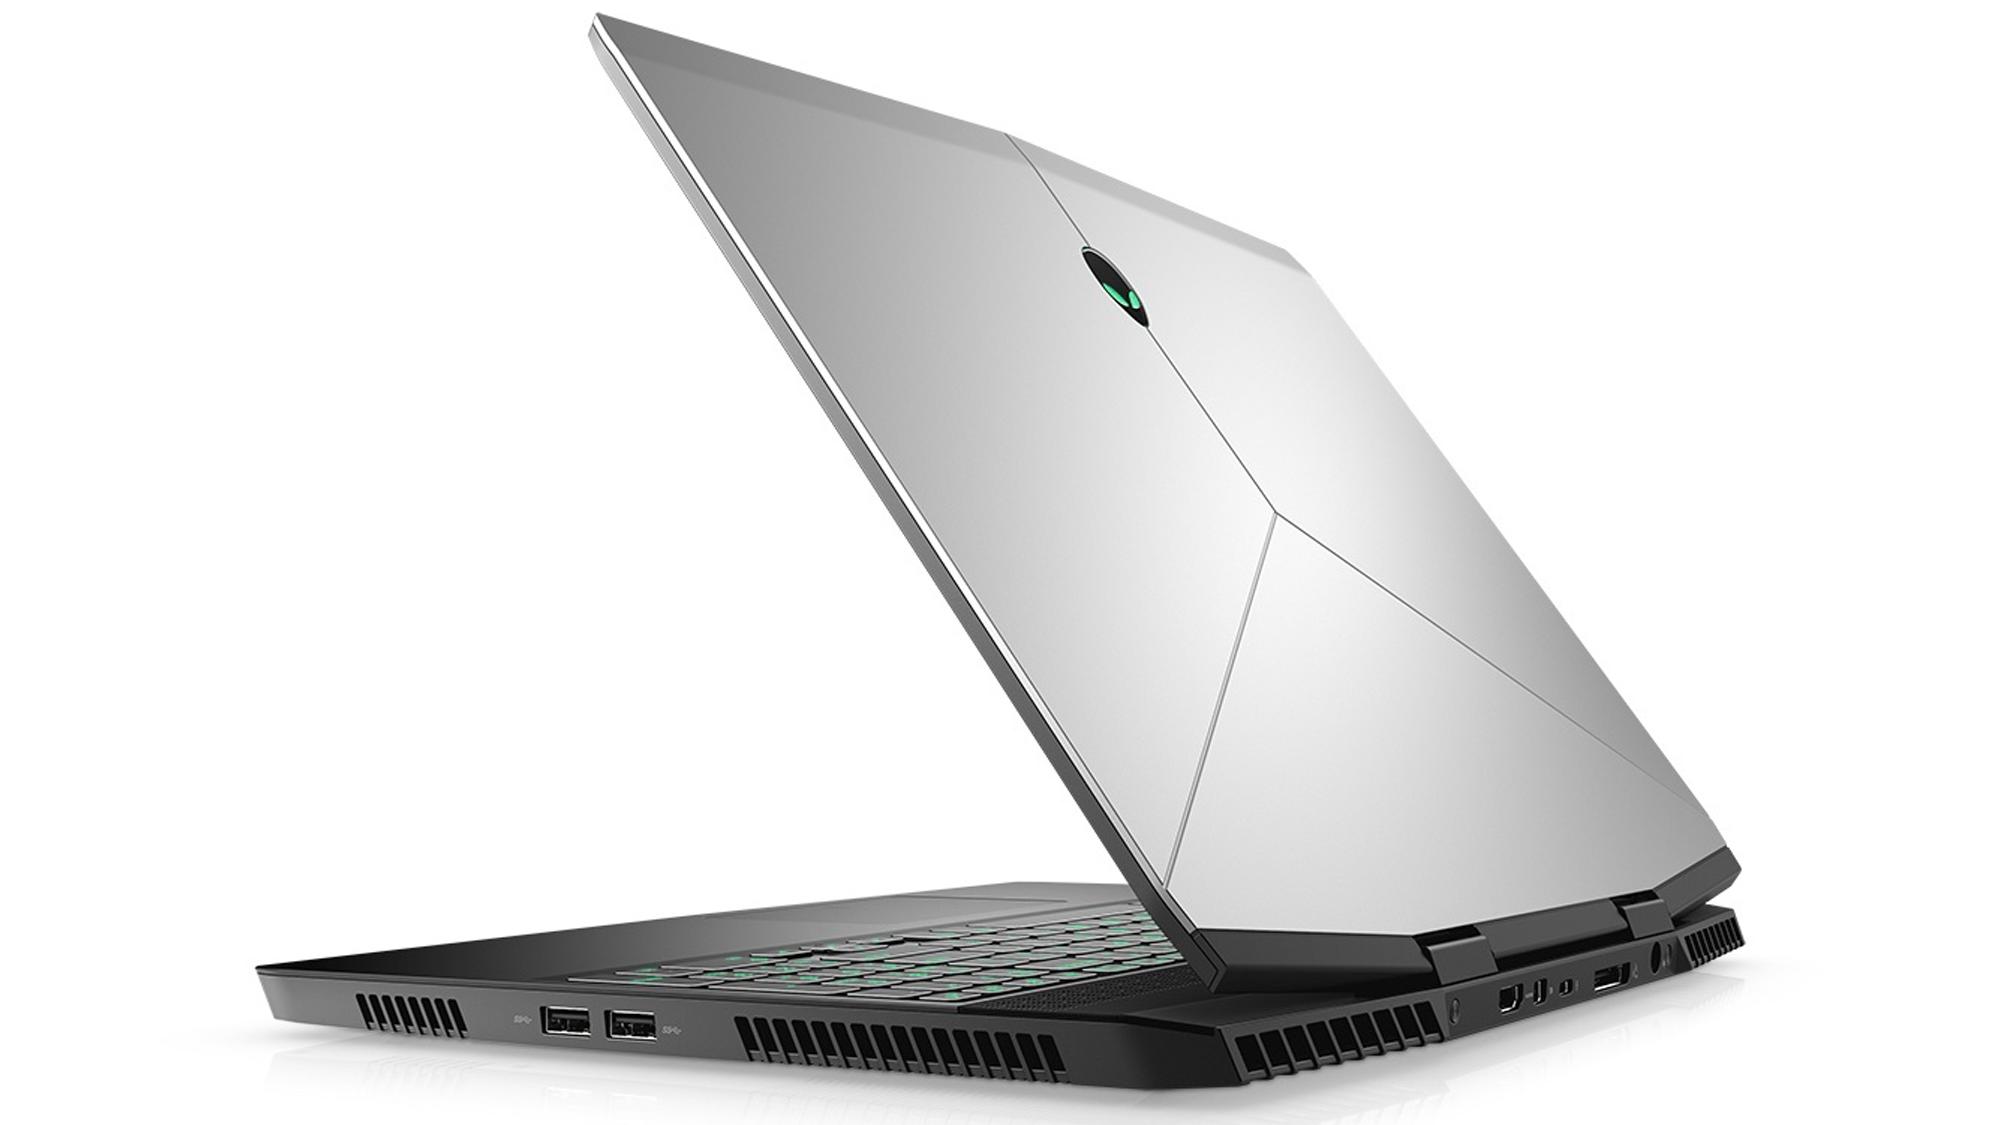 dell, alienware, m15, gaming laptop, alienware m15, maxq,